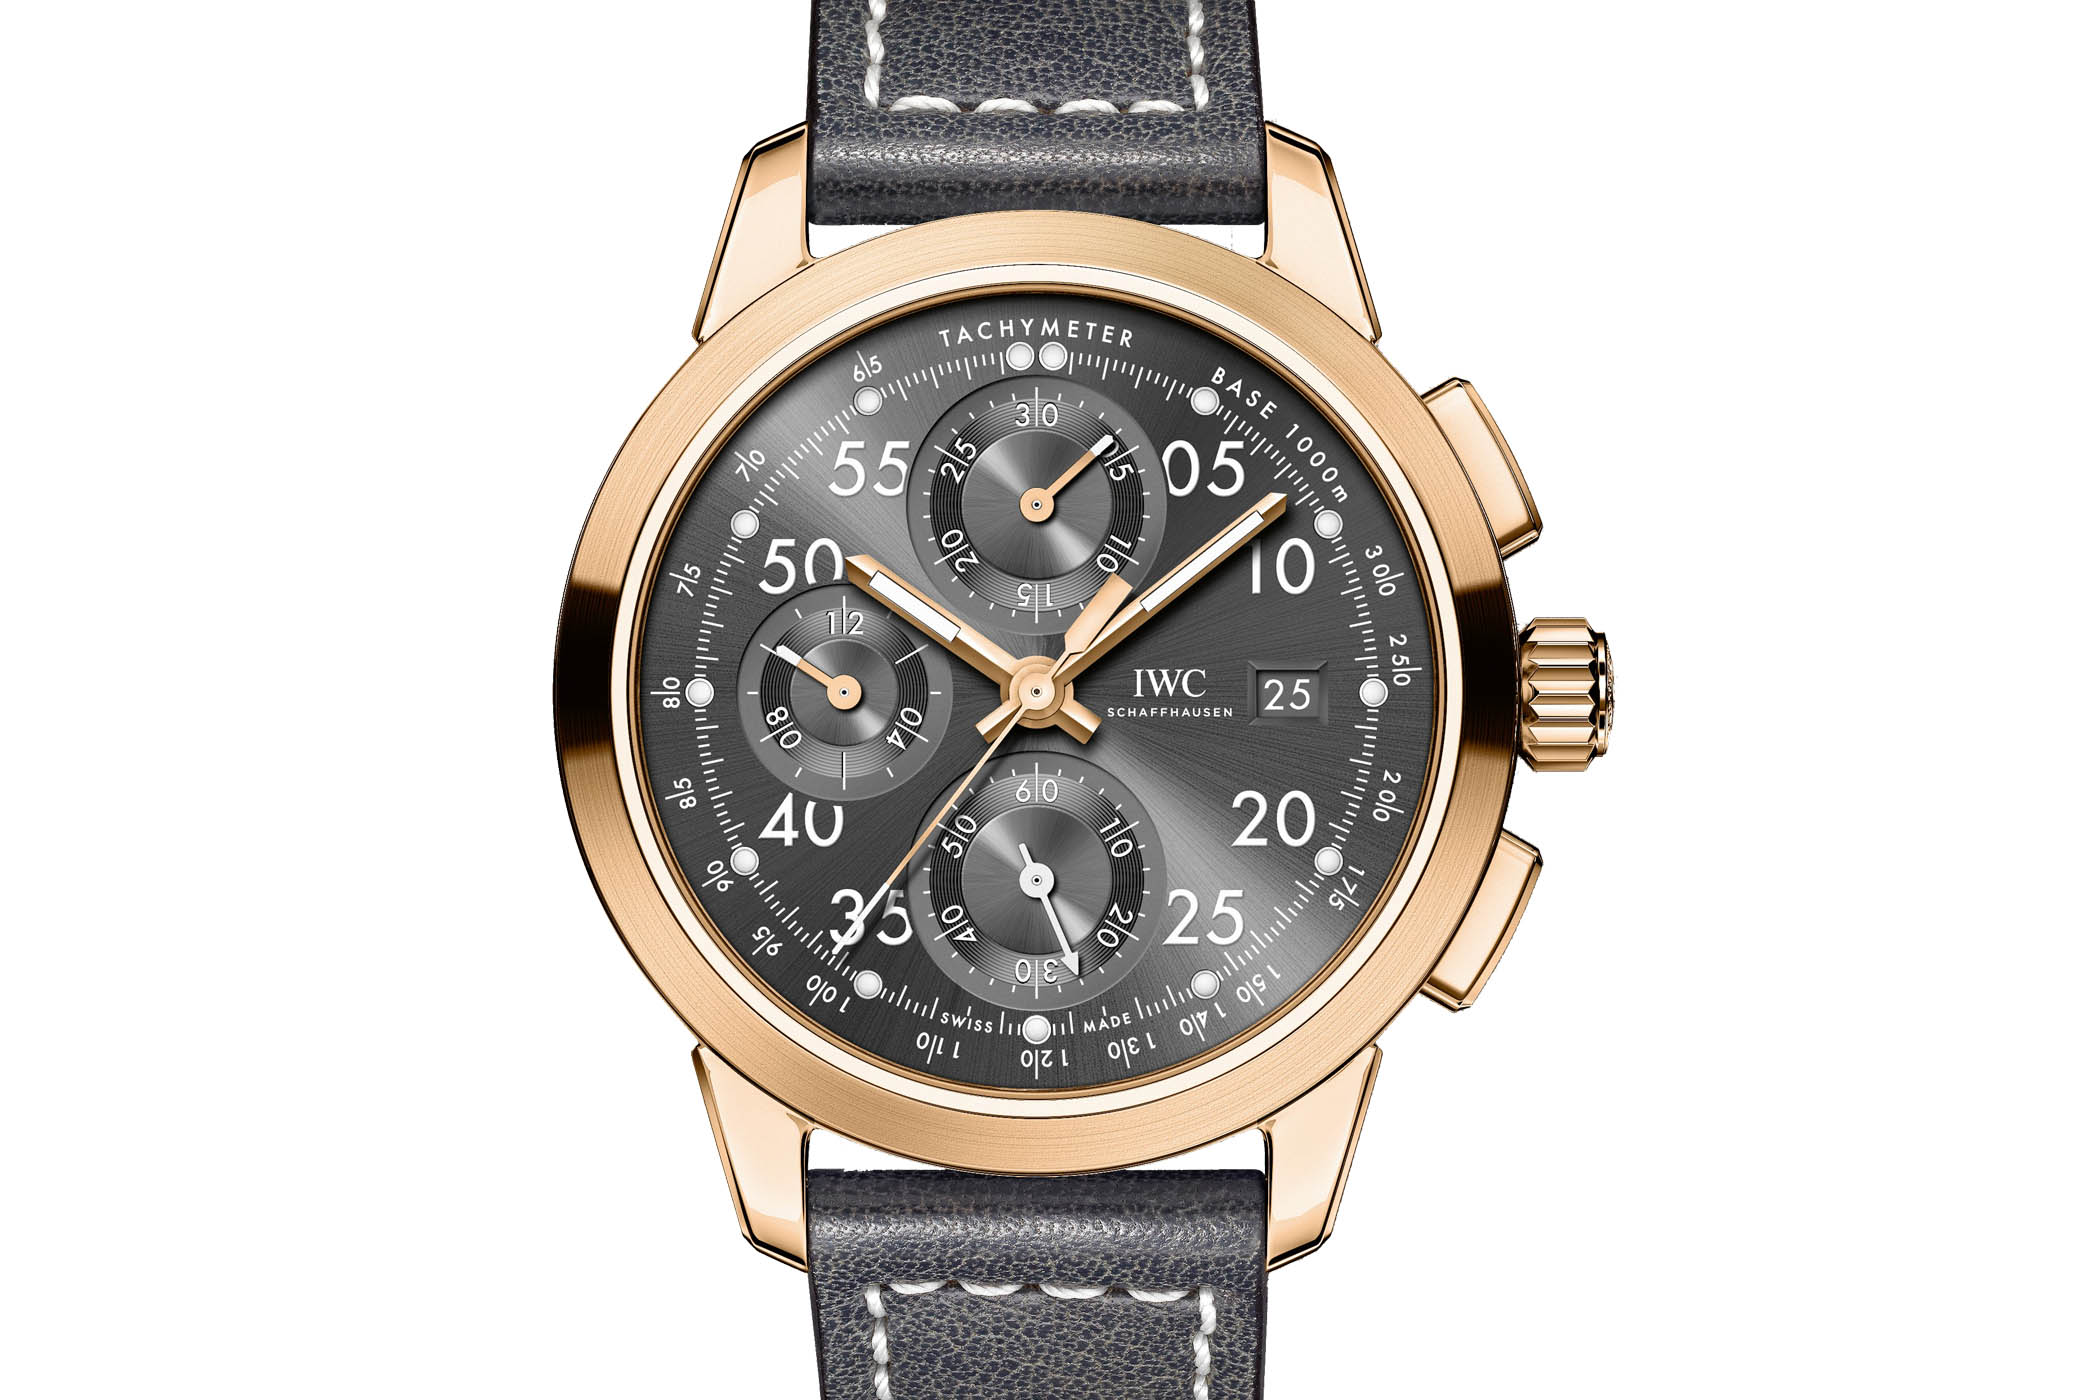 IWC Ingenieur Chronograph Tribute to Nico Rosberg